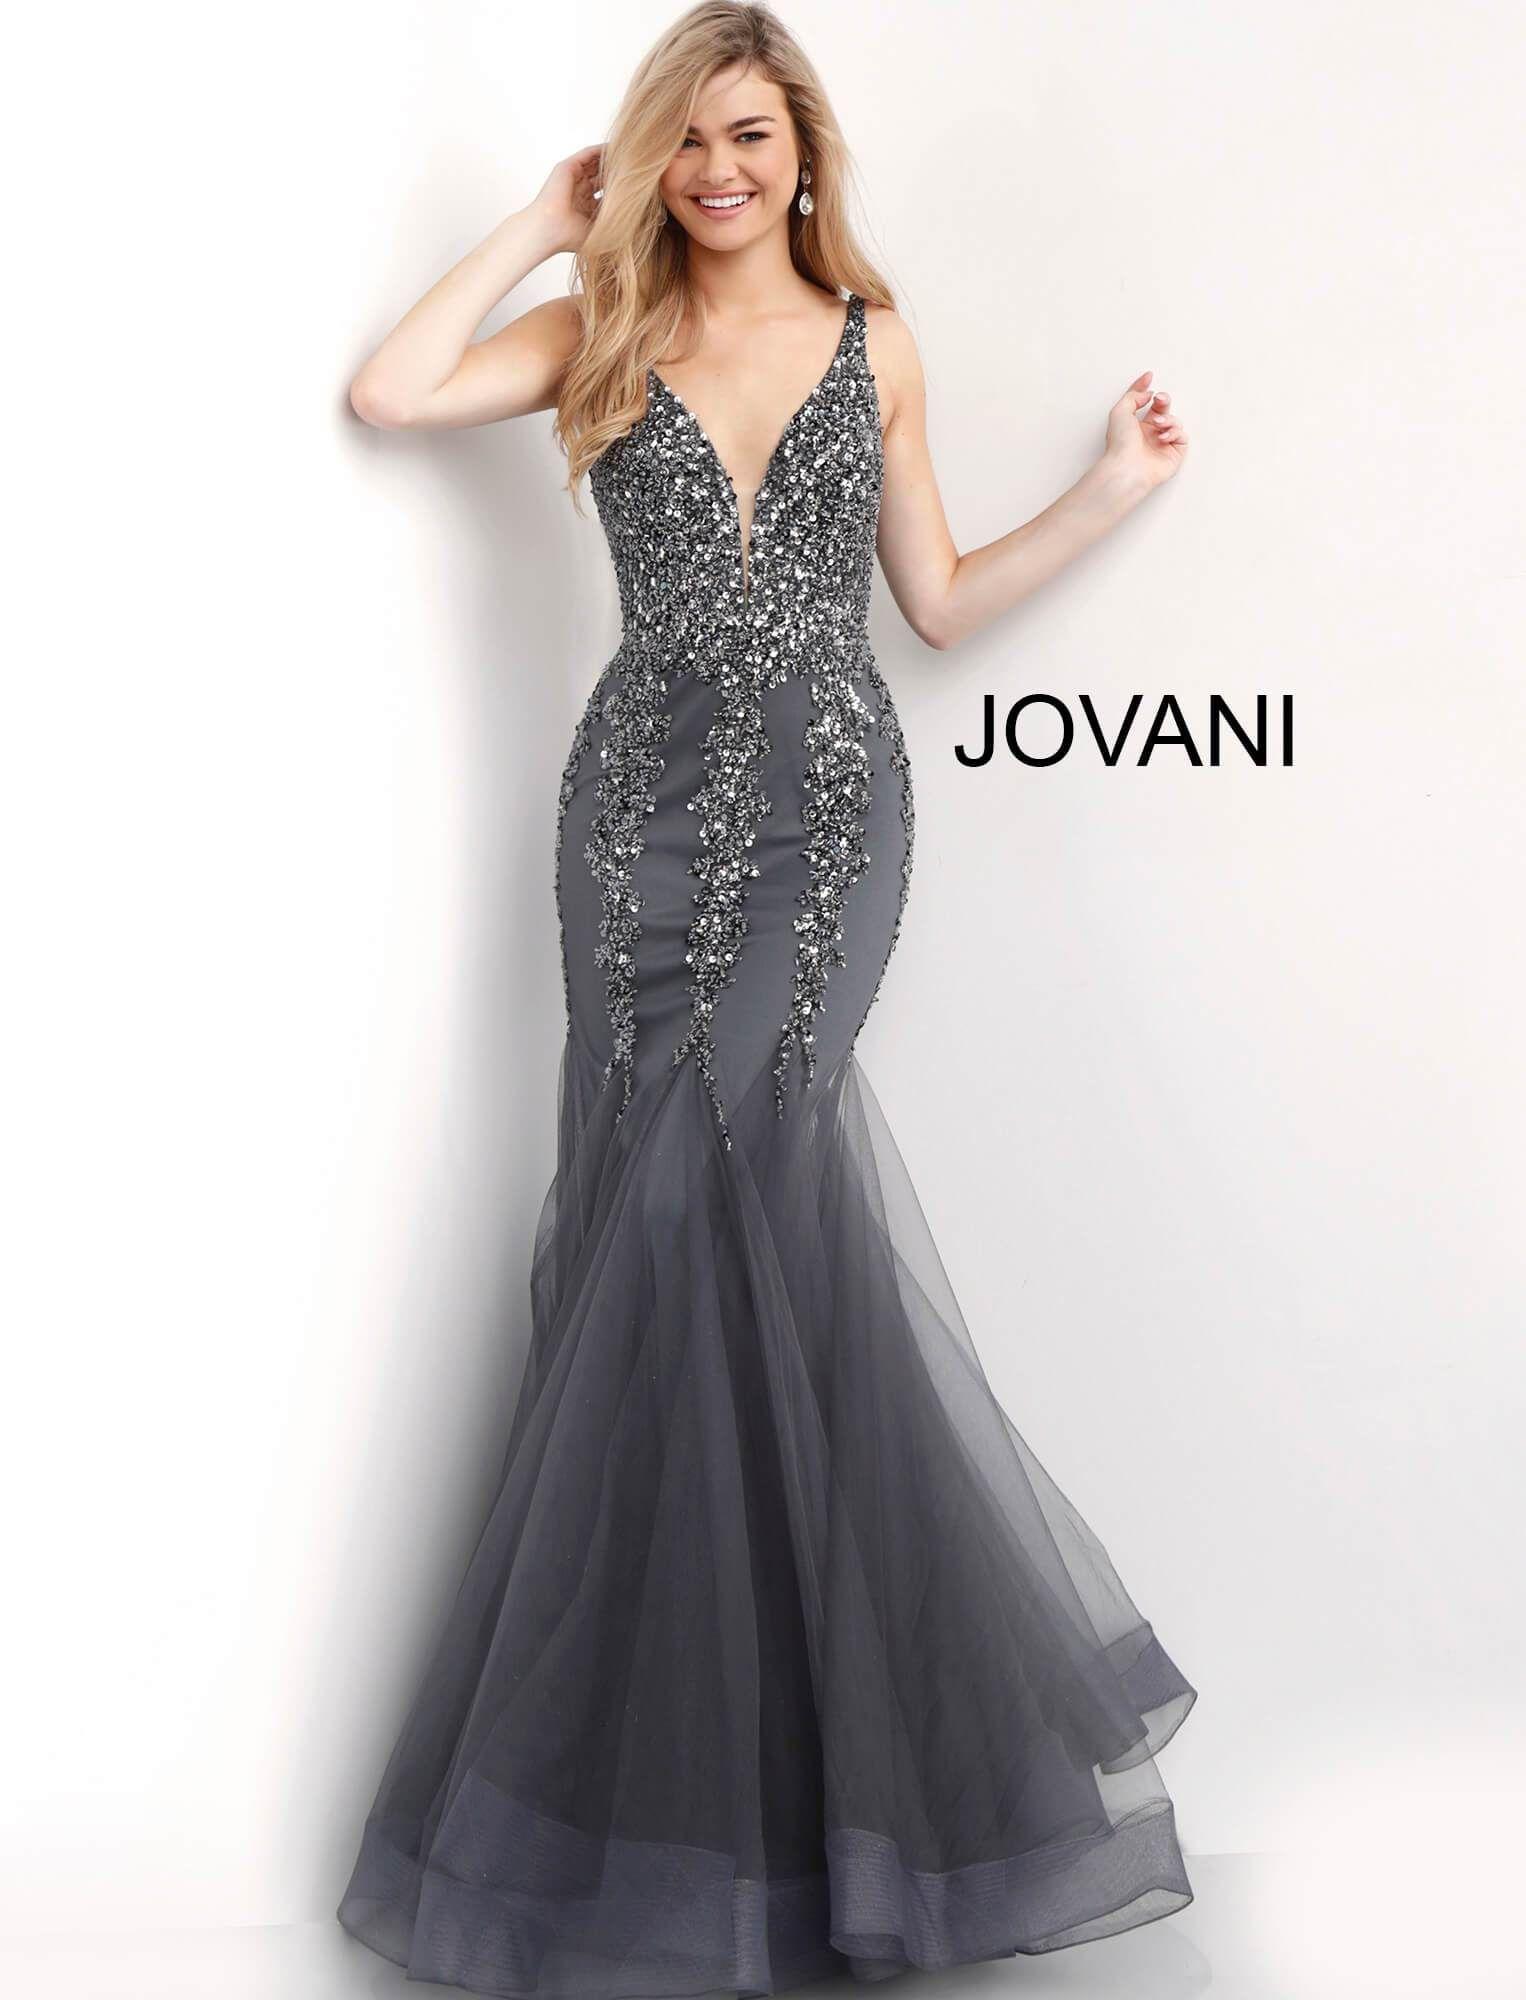 Jovani prom dress style 63700 in 2019  f466c2a20